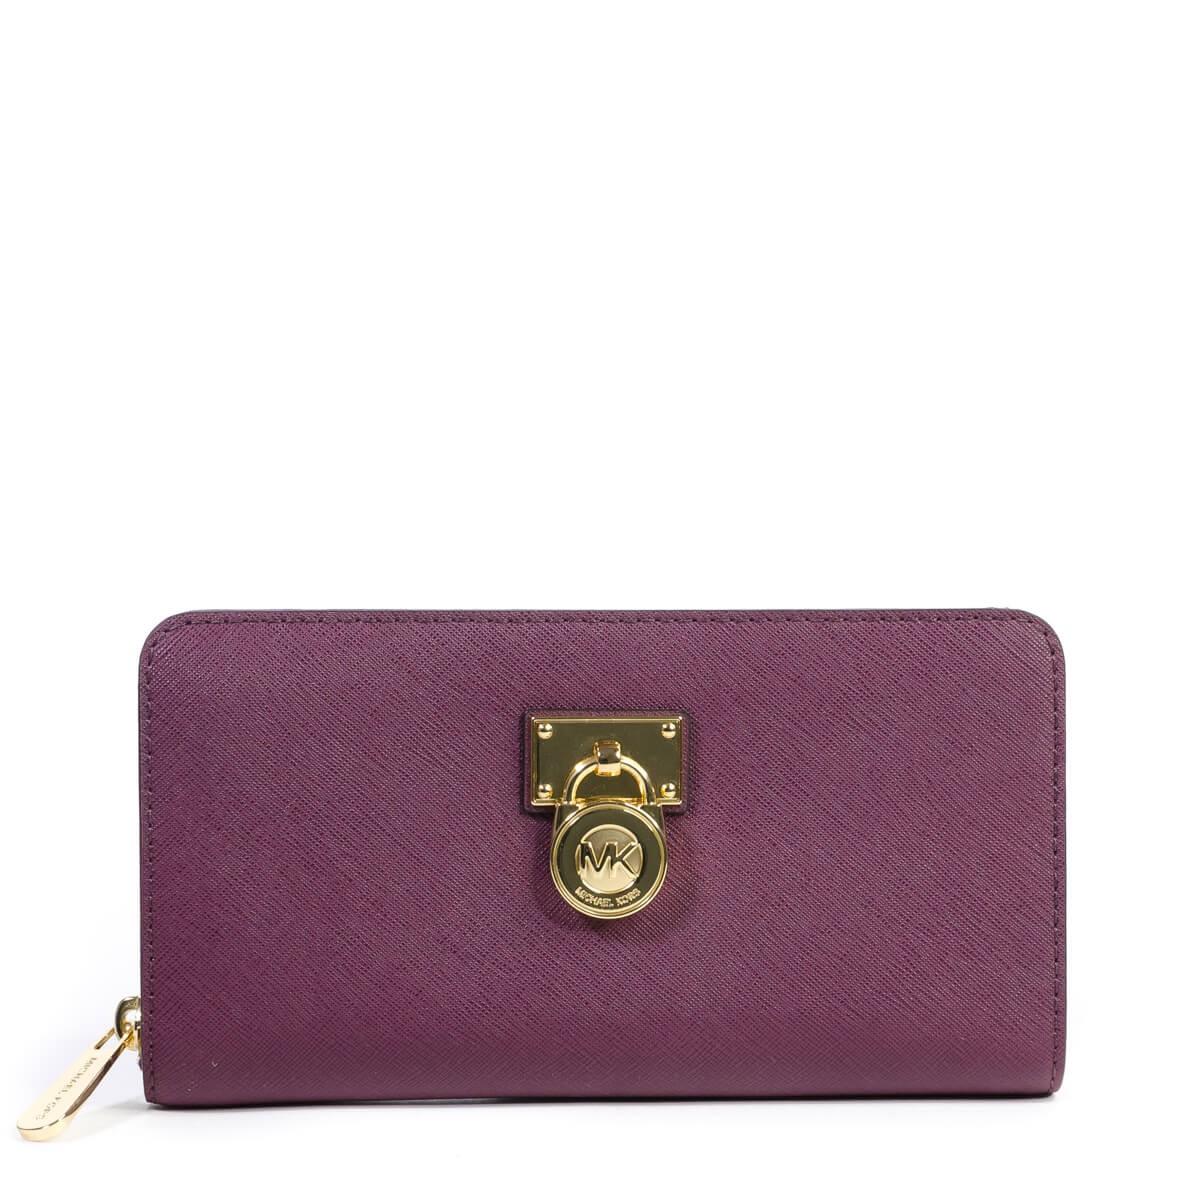 c2b5151379194 Plum New Hamilton Traveler Large Zip Around Saffiano Leather Wallet